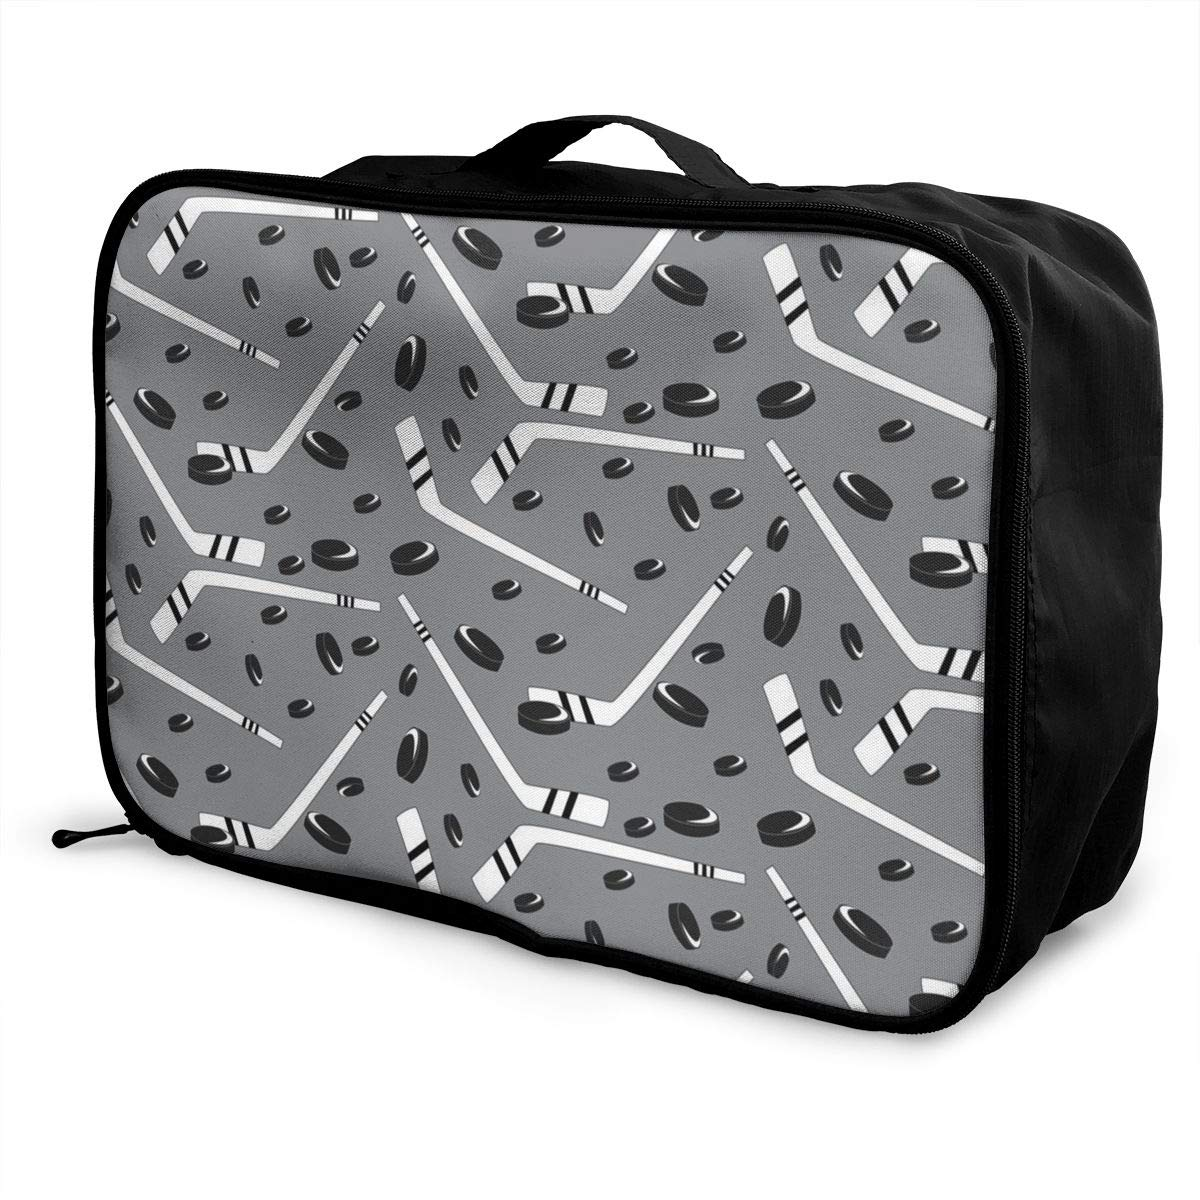 Travel Duffel Bag Waterproof Fashion Lightweight Large Capacity Portable Luggage Bag Grey Hockey